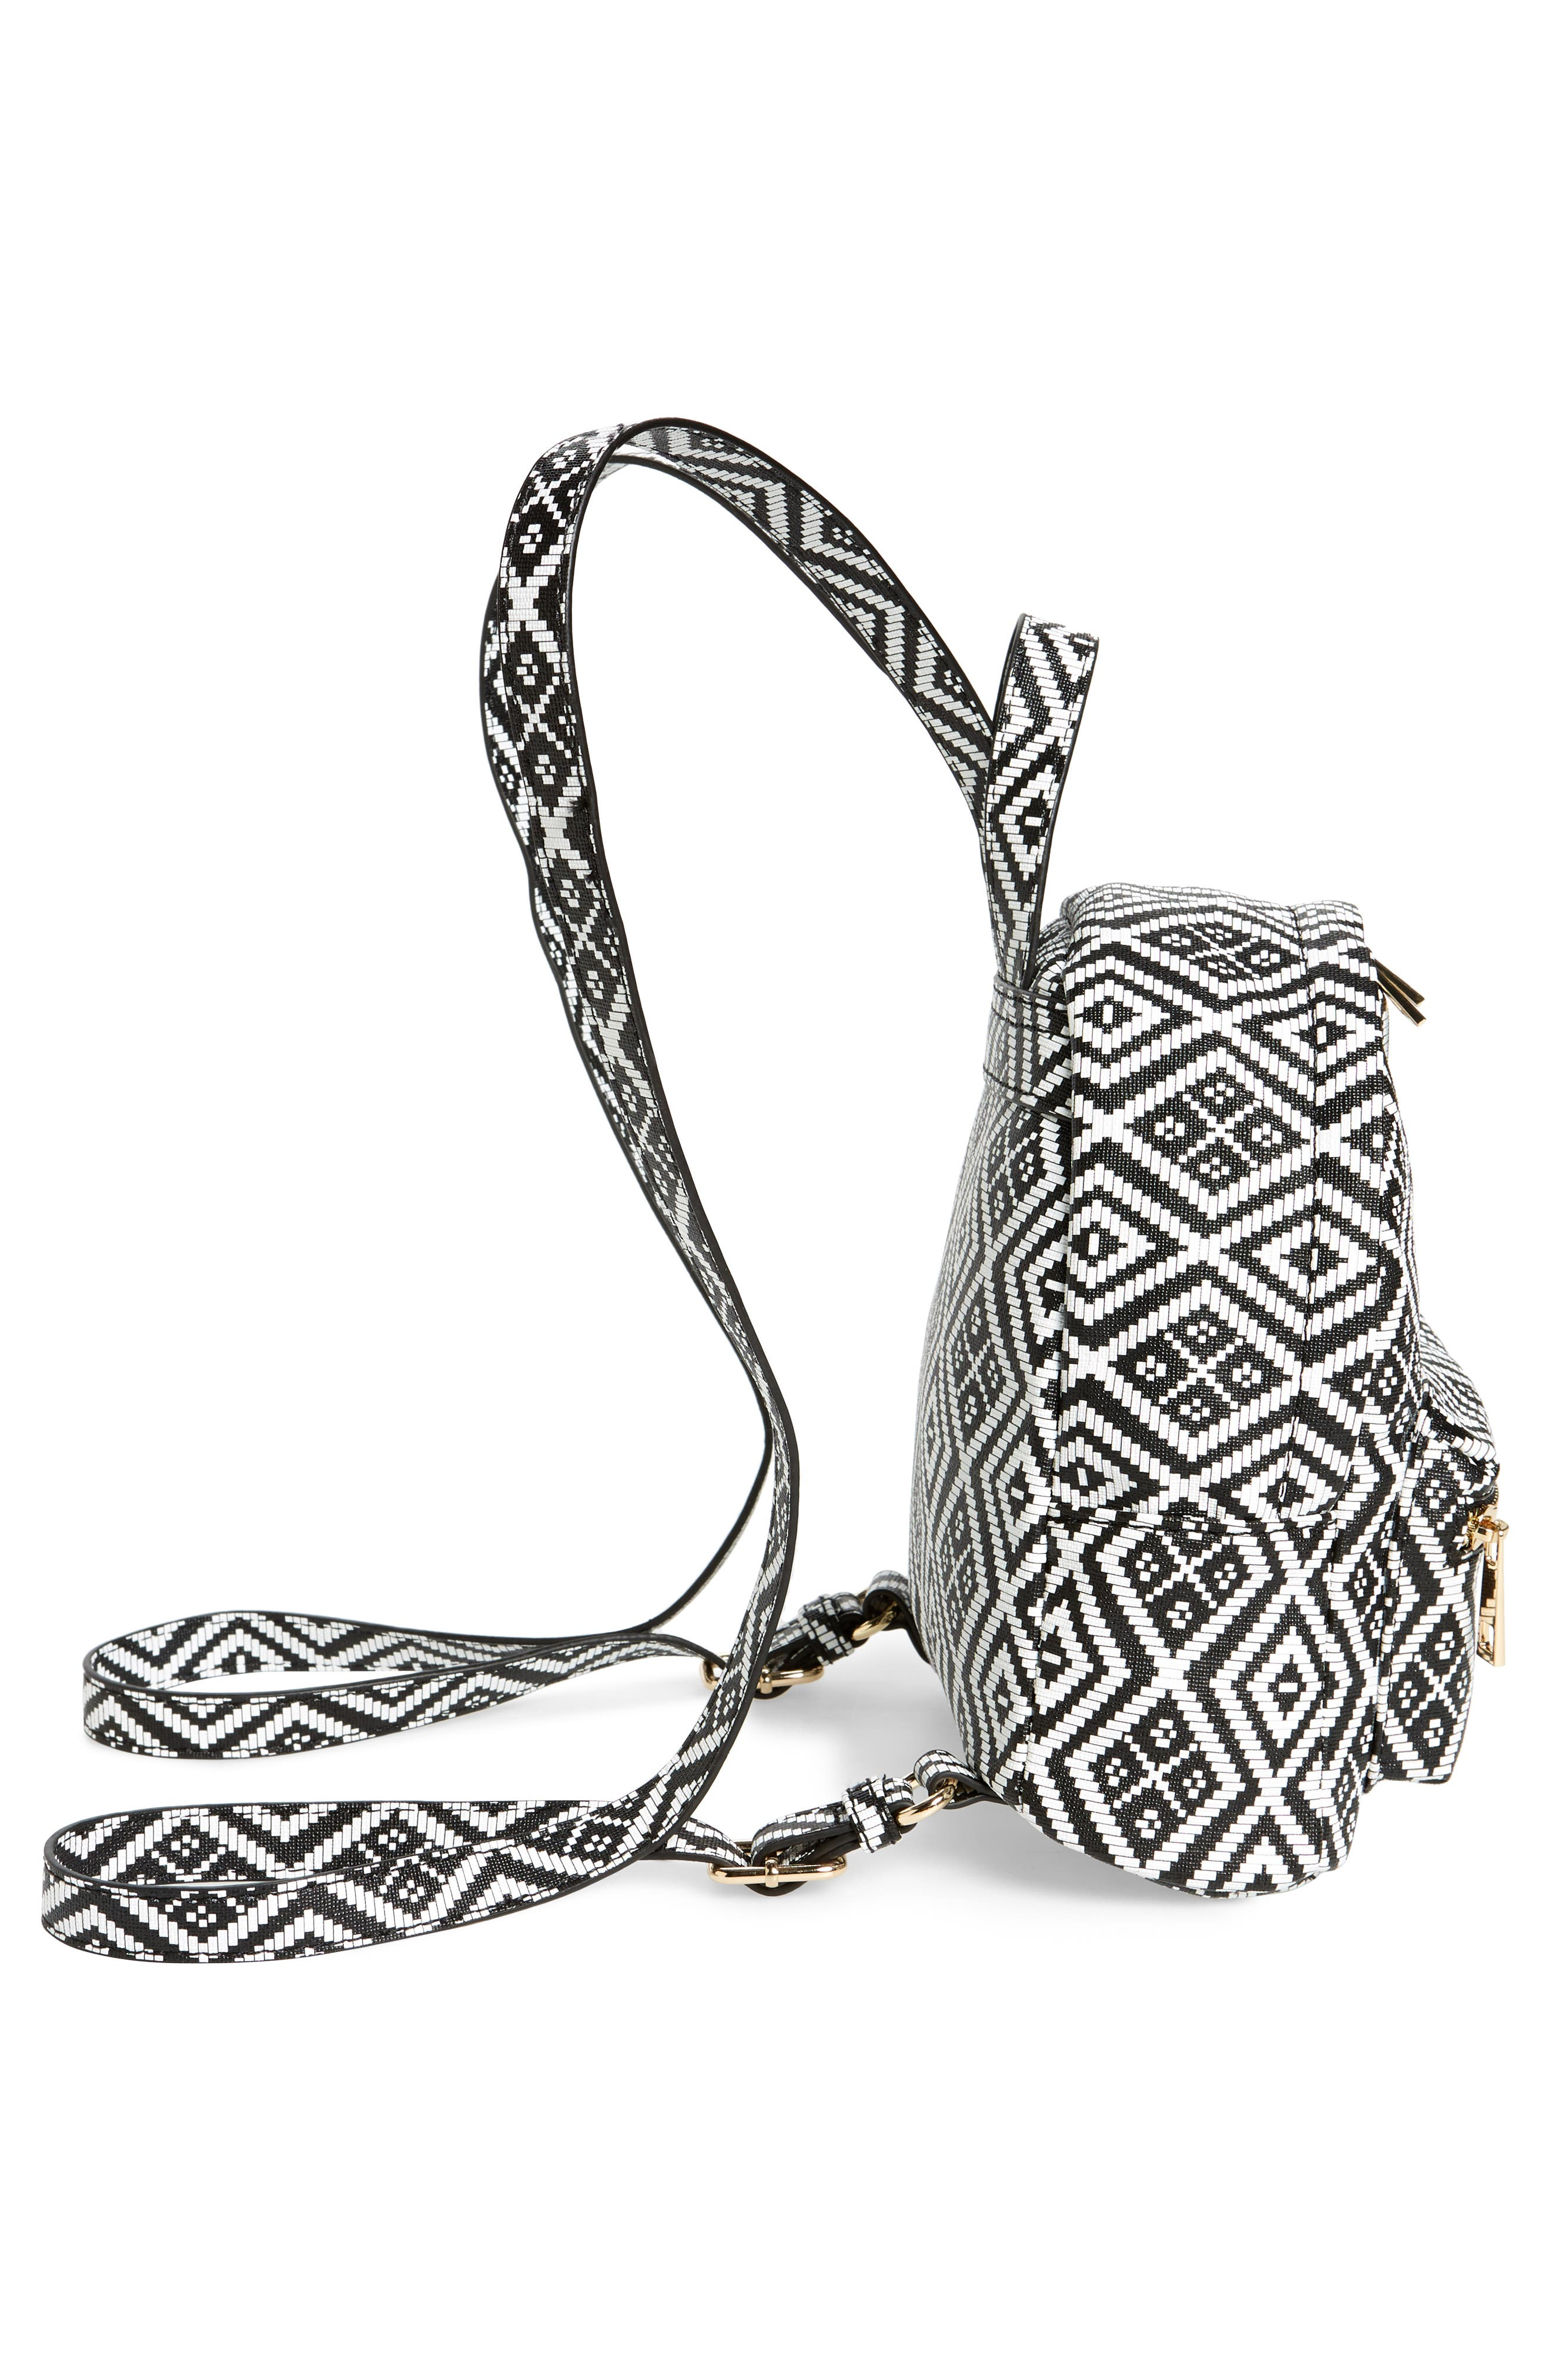 Weave Pattern Faux Leather Mini Backpack,                             Alternate thumbnail 4, color,                             Black/ White